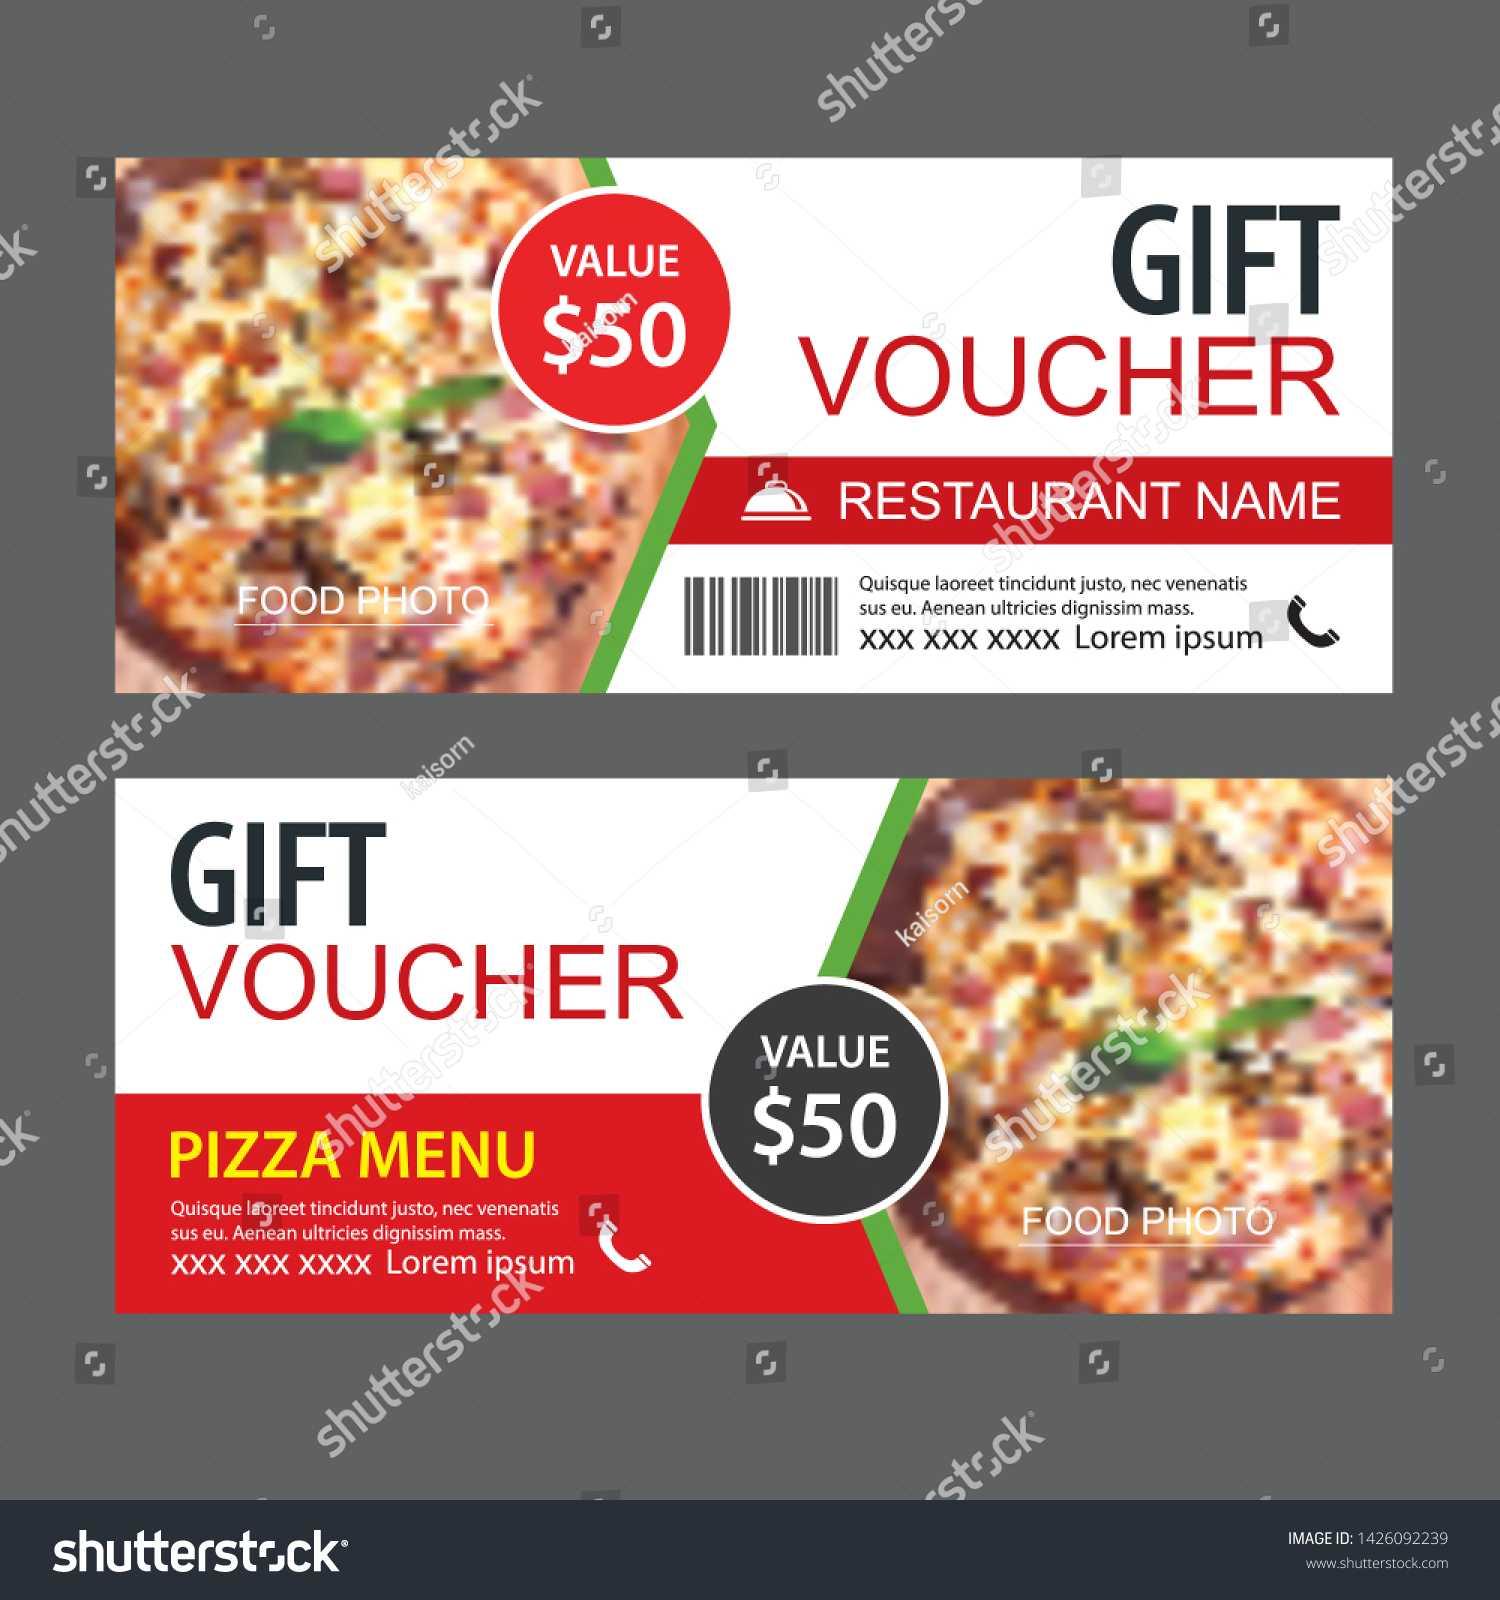 Стоковая Векторная Графика «Discount Gift Voucher Fast Food For Pizza Gift Certificate Template